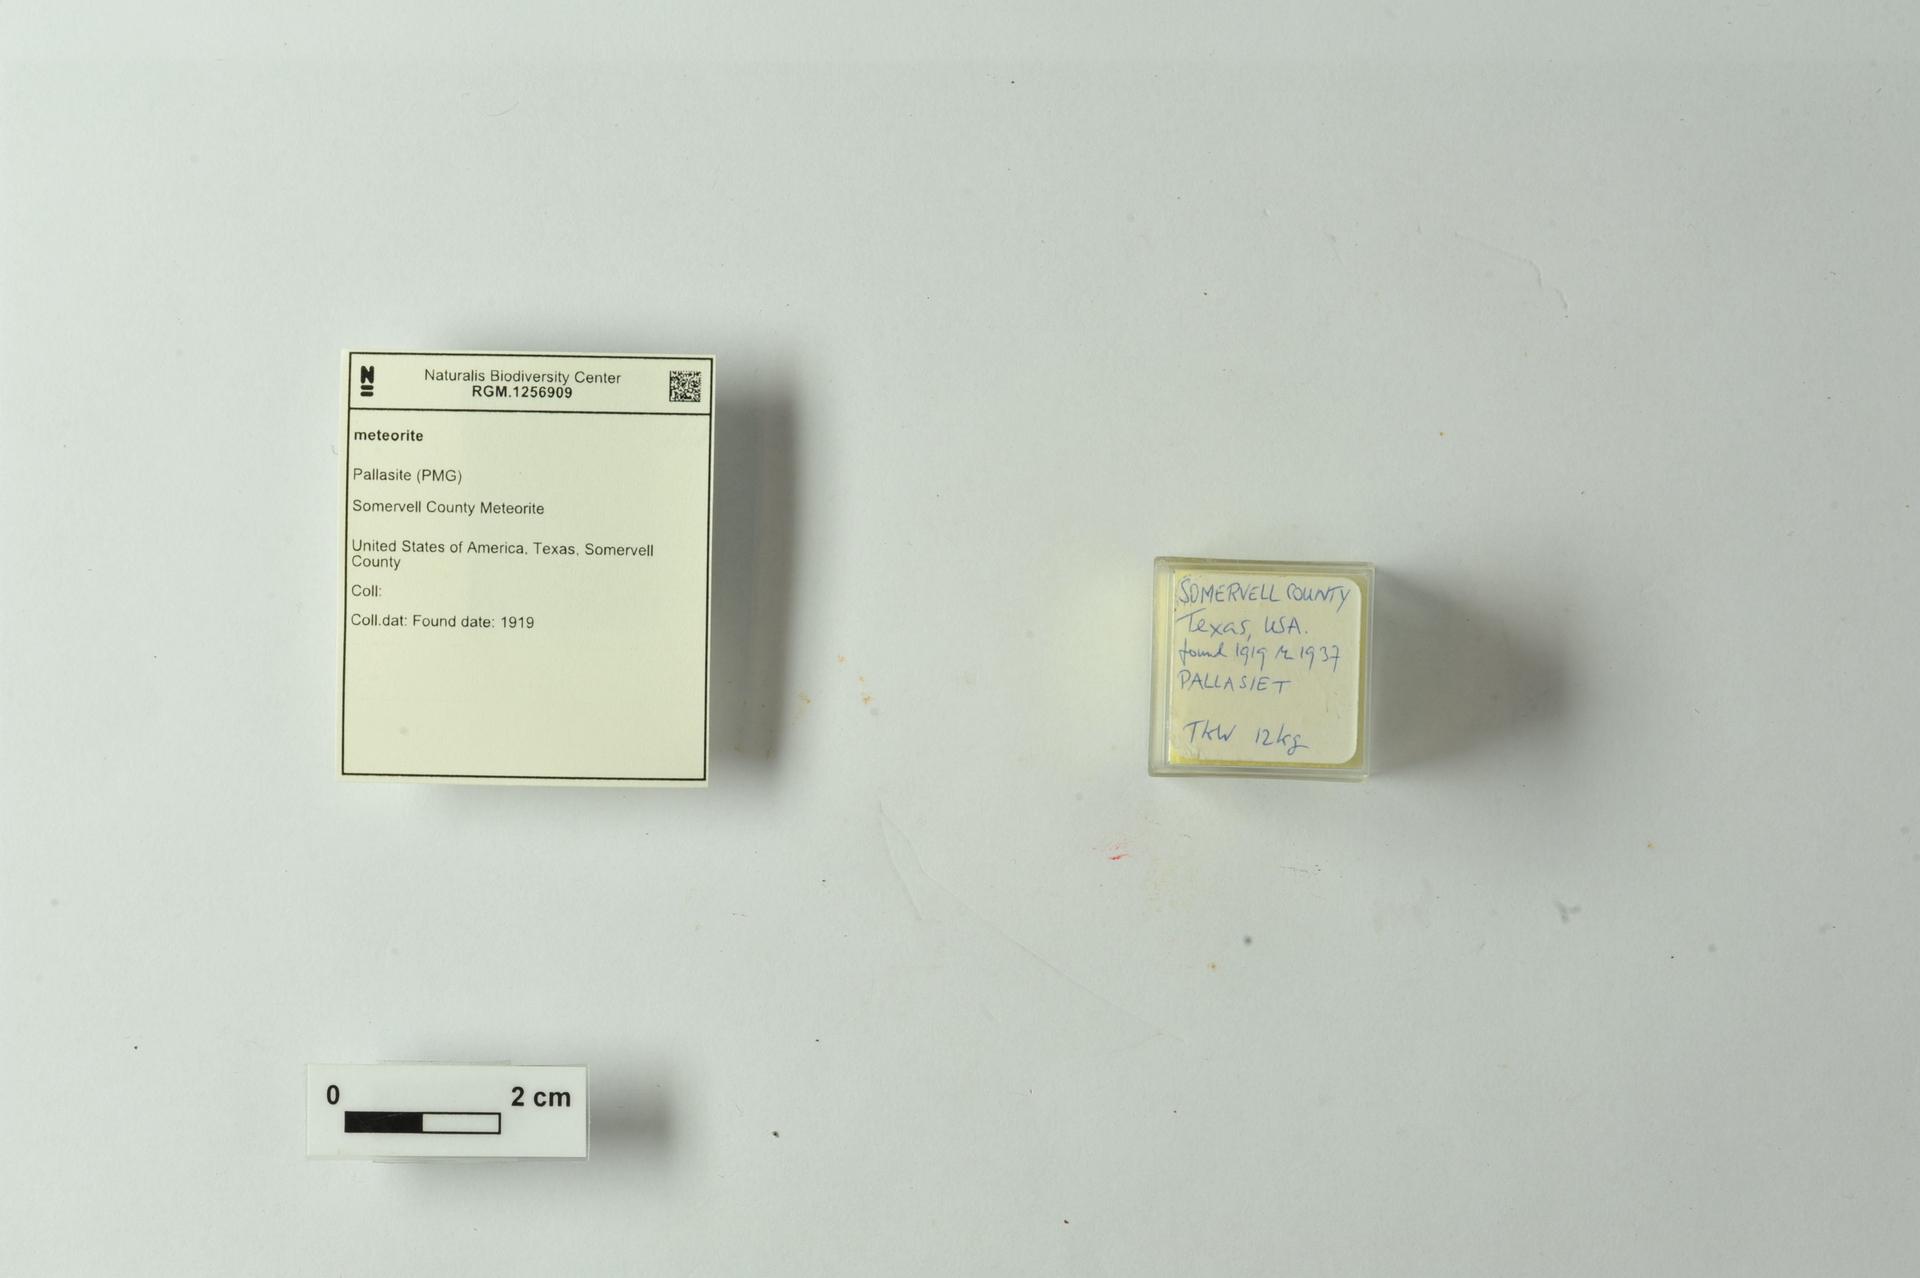 RGM.1256909 | Pallasite (PMG)